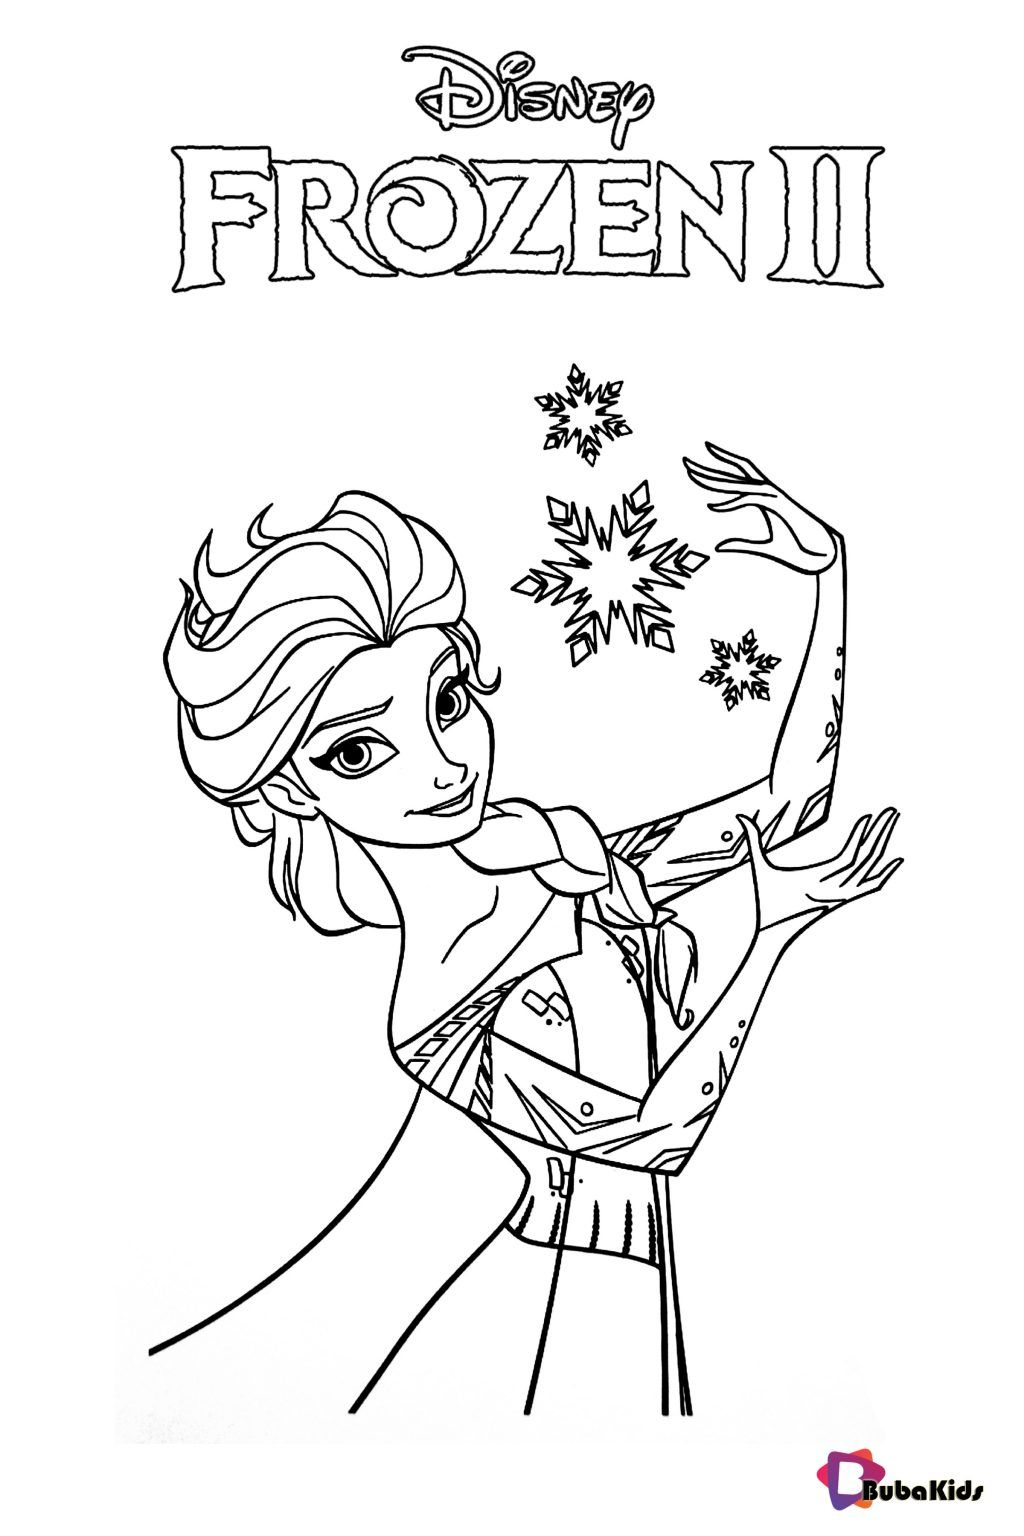 Frozen 2 Queen Elsa Coloring Page Bubakids Bubakids Com Bubakids Com In 2020 Elsa Coloring Pages Dance Coloring Pages Coloring Books